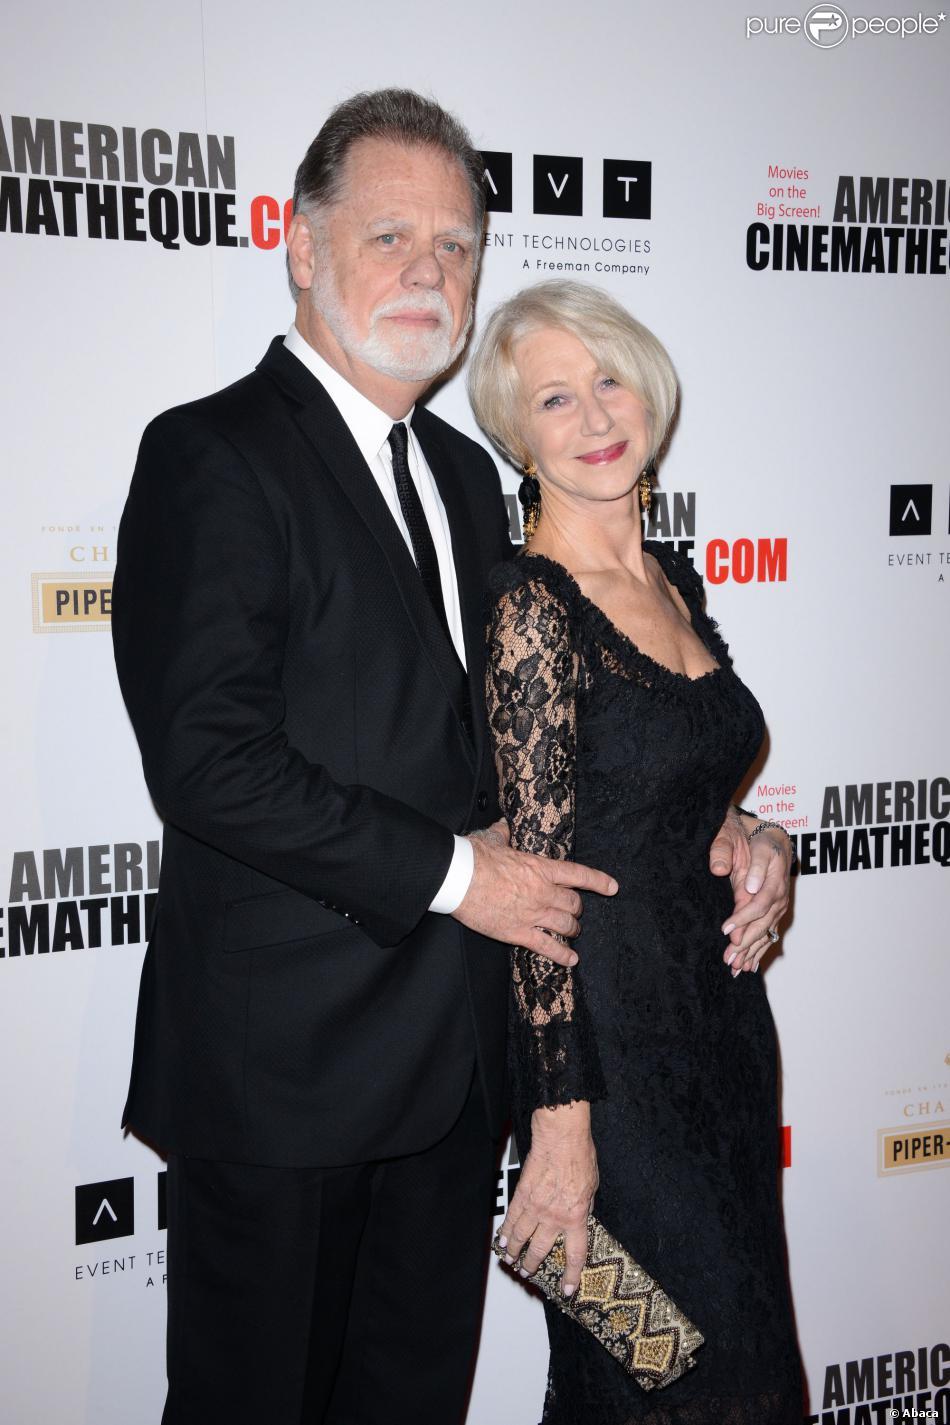 Taylor Hackford et sa femme Helen Mirren lors des 27e American Cinematheque Awards qui honorent Jerry Bruckheimer à Beverly Hills le 12 décembre 2013